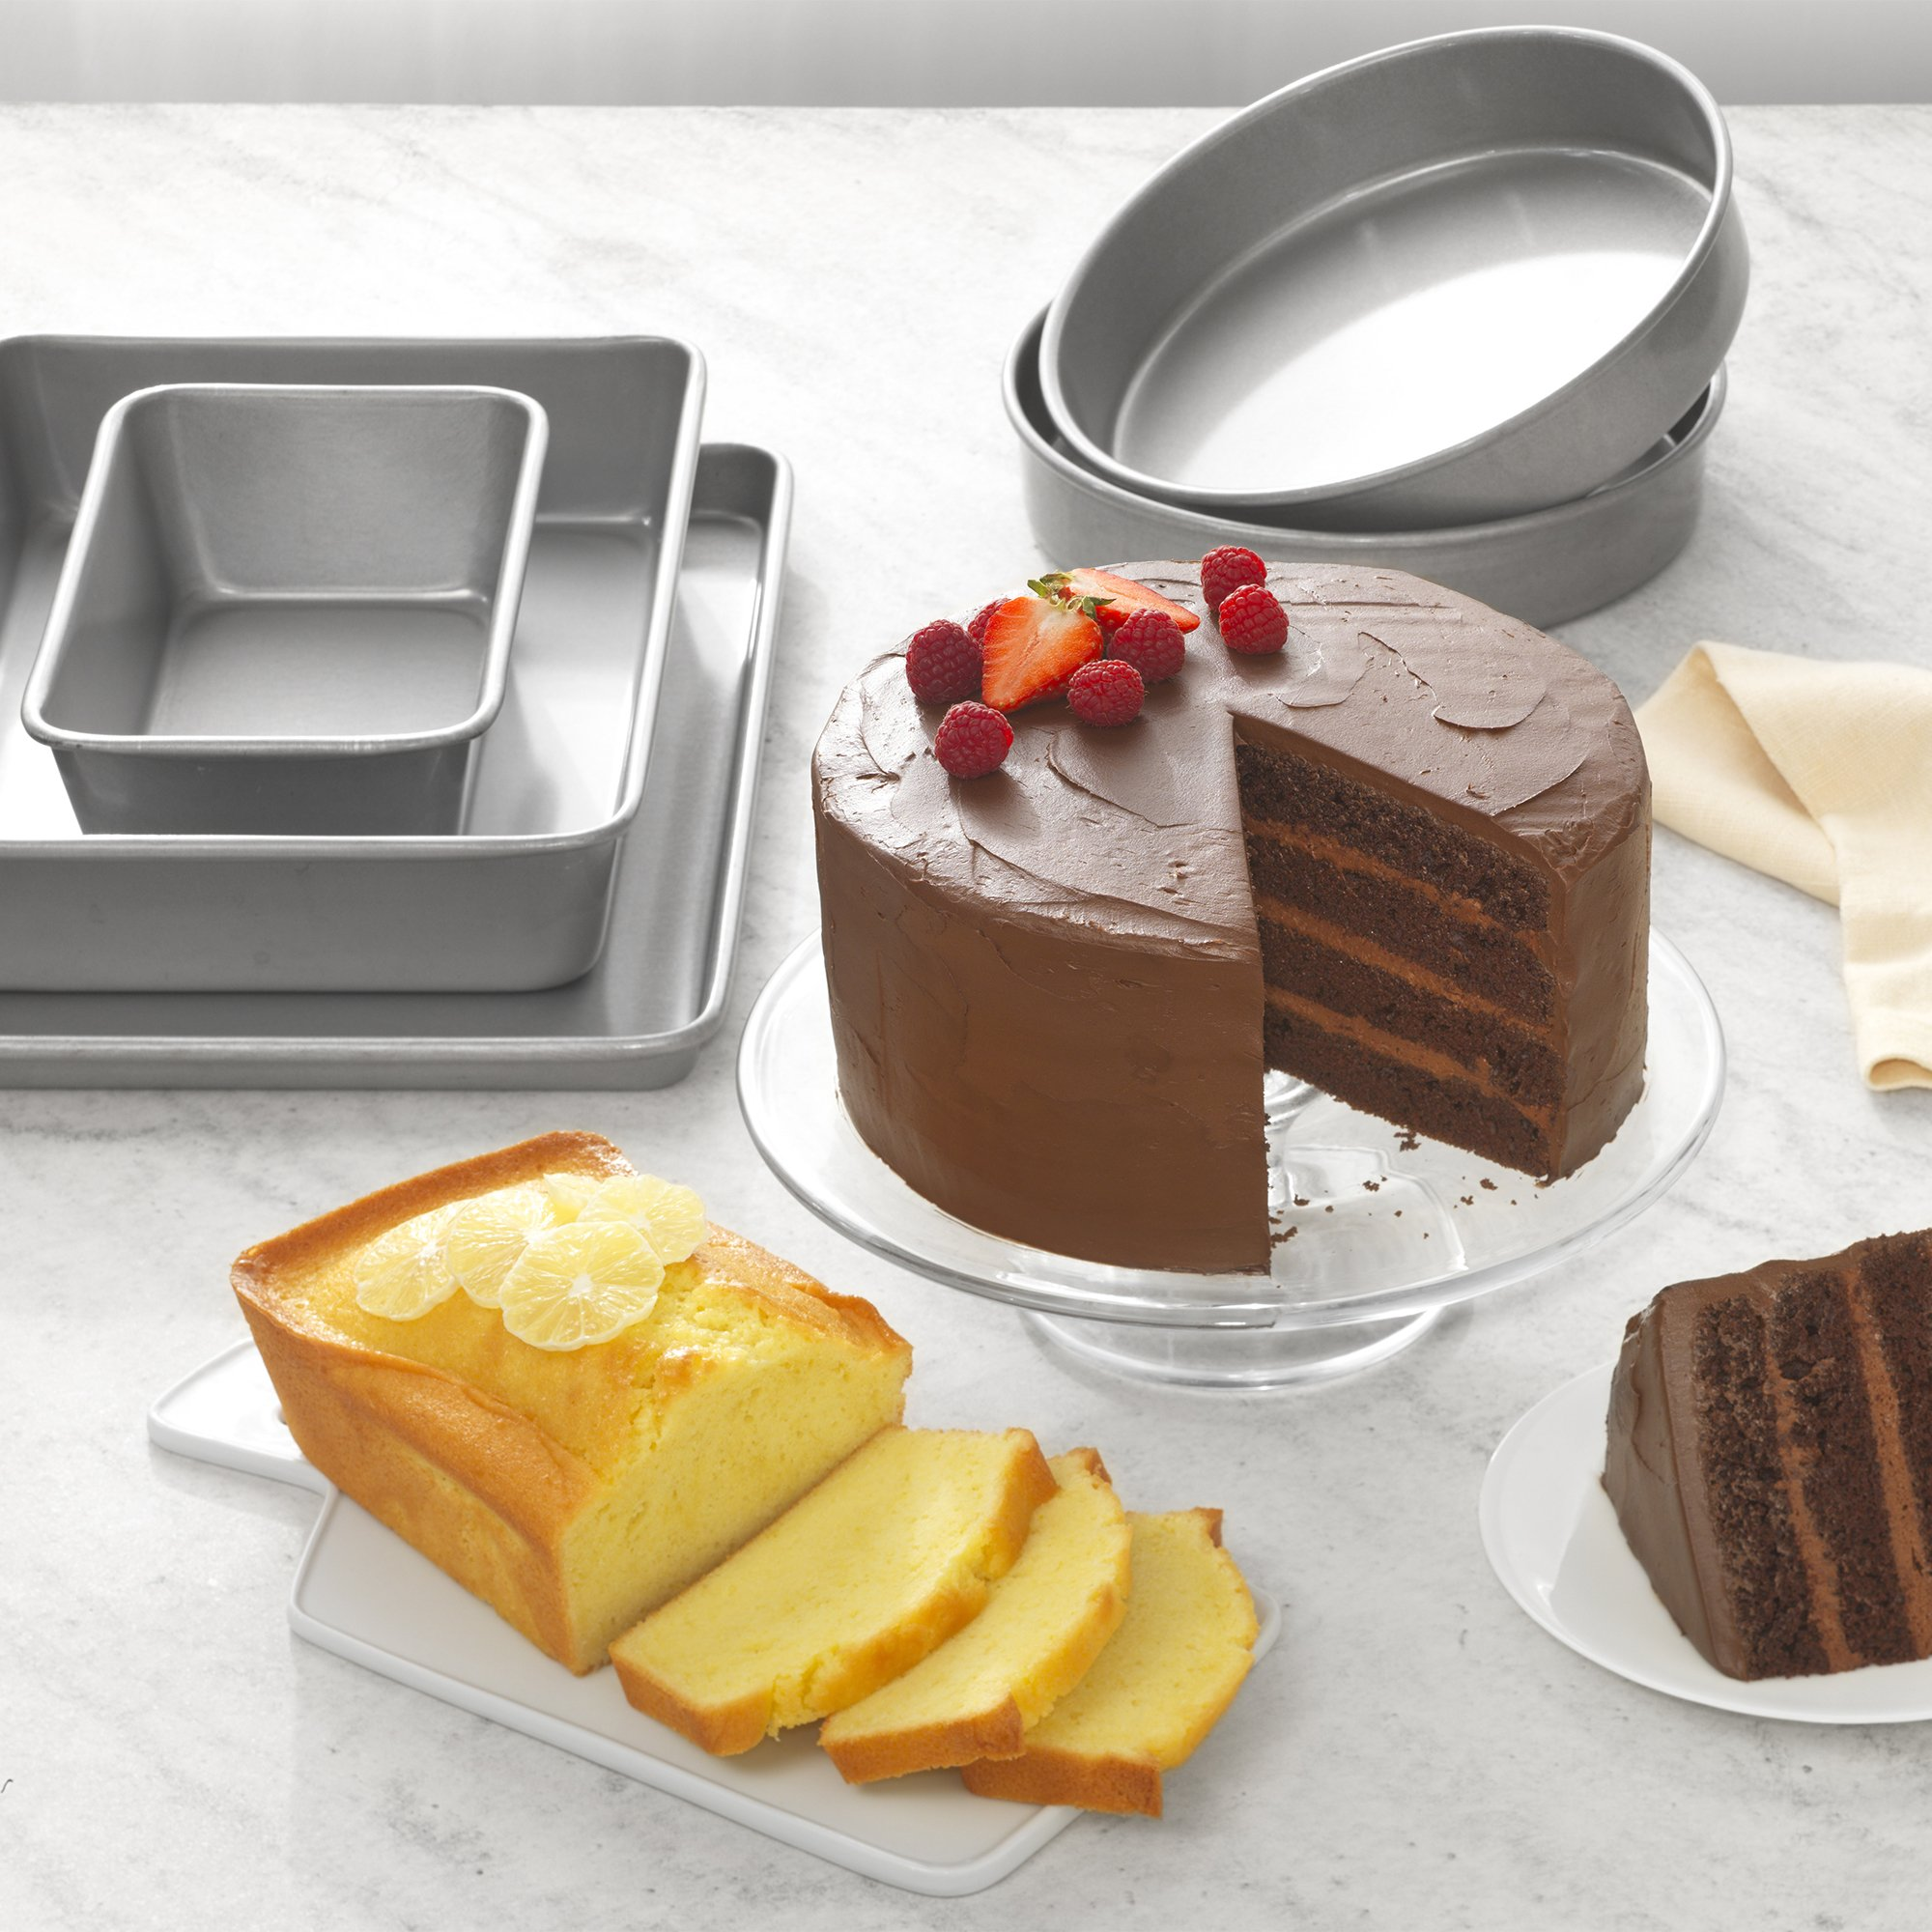 Emeril Lagasse 62670 Aluminized Steel Nonstick 5-Piece Bakeware Set by Emeril Lagasse (Image #9)